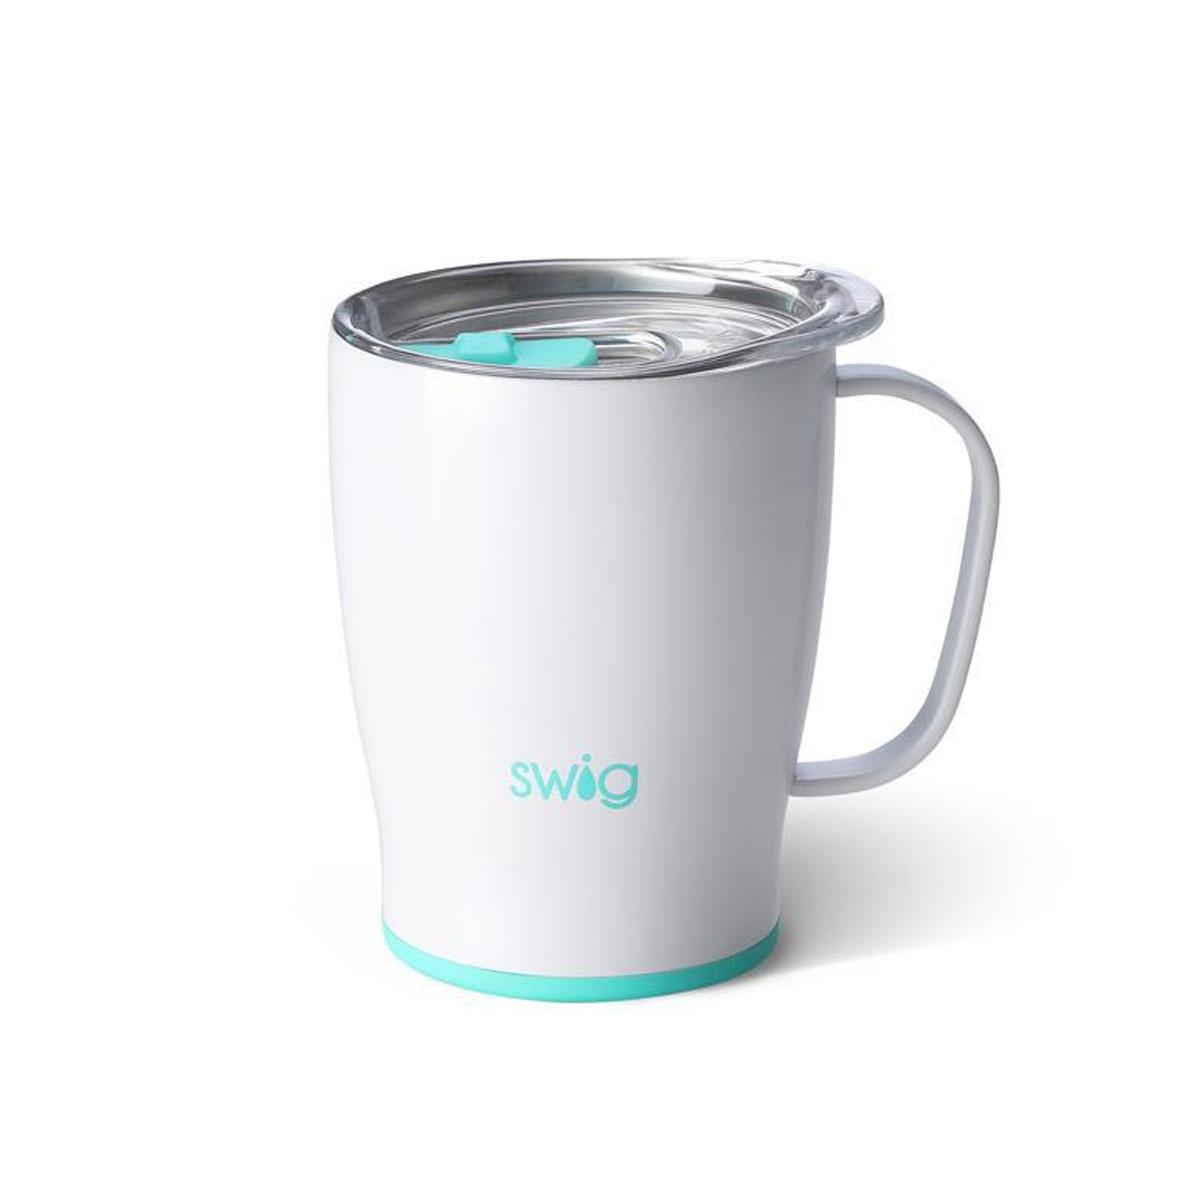 Swig0white